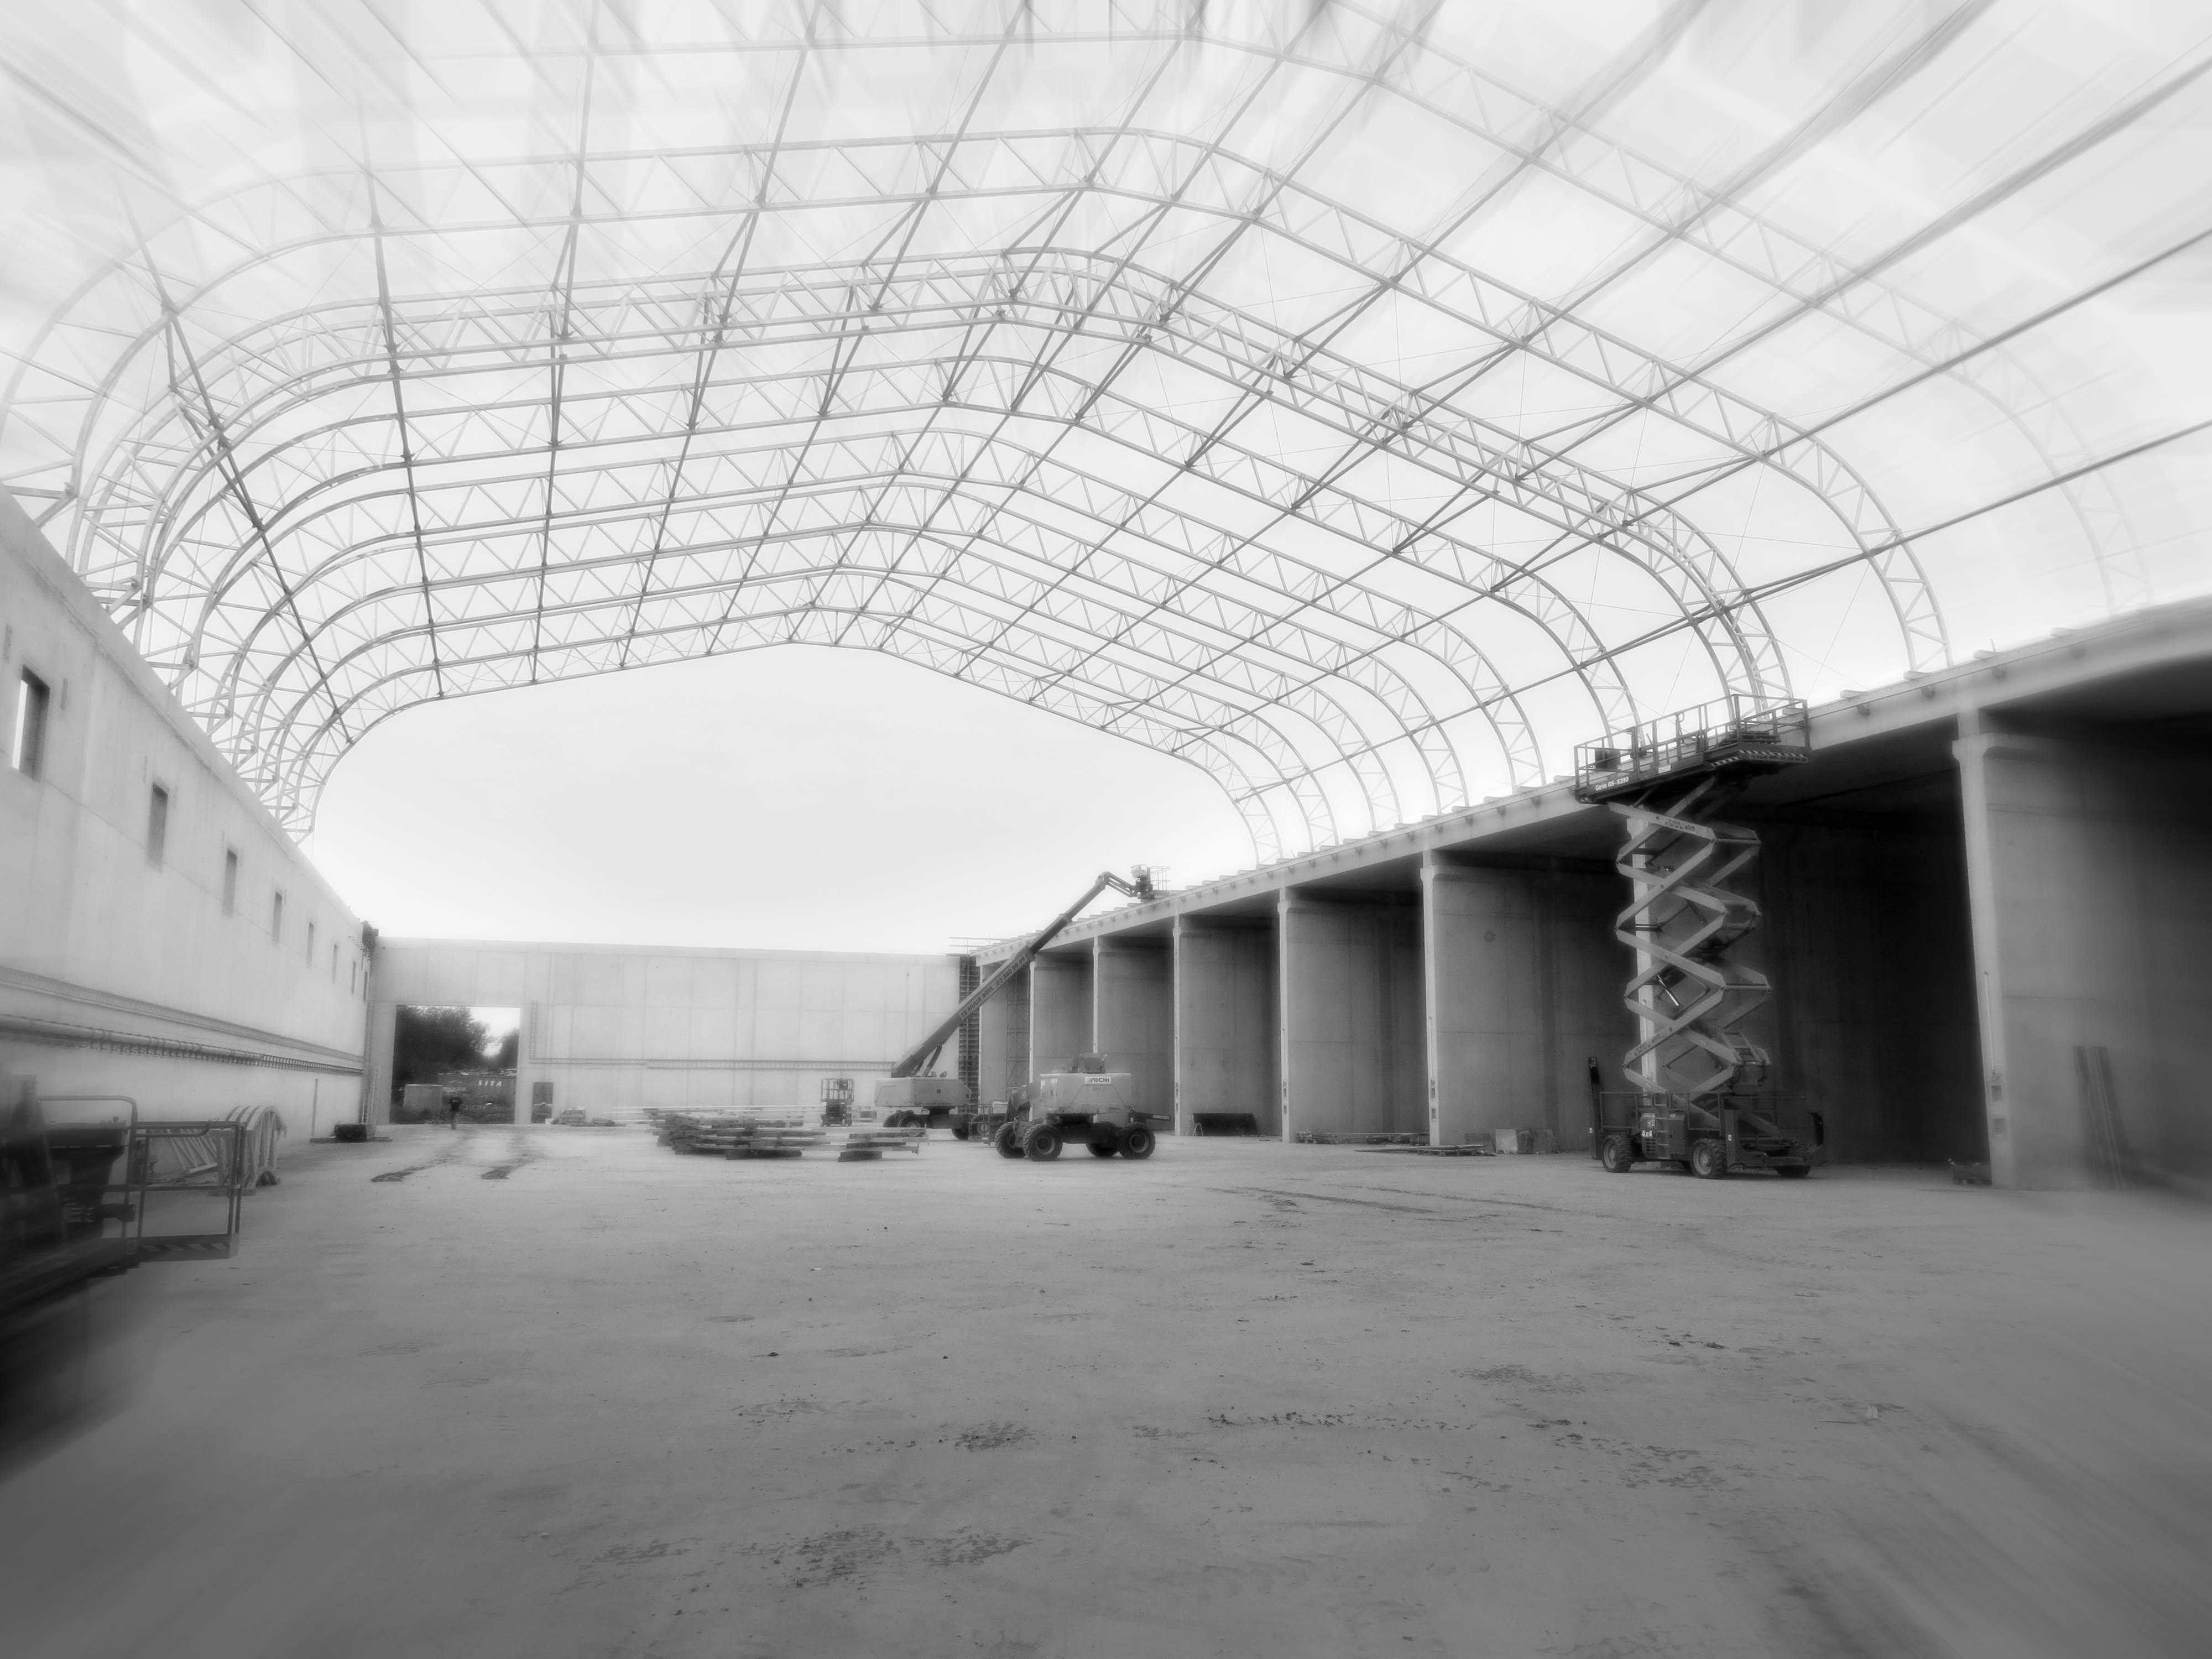 Betonwanden industriehal